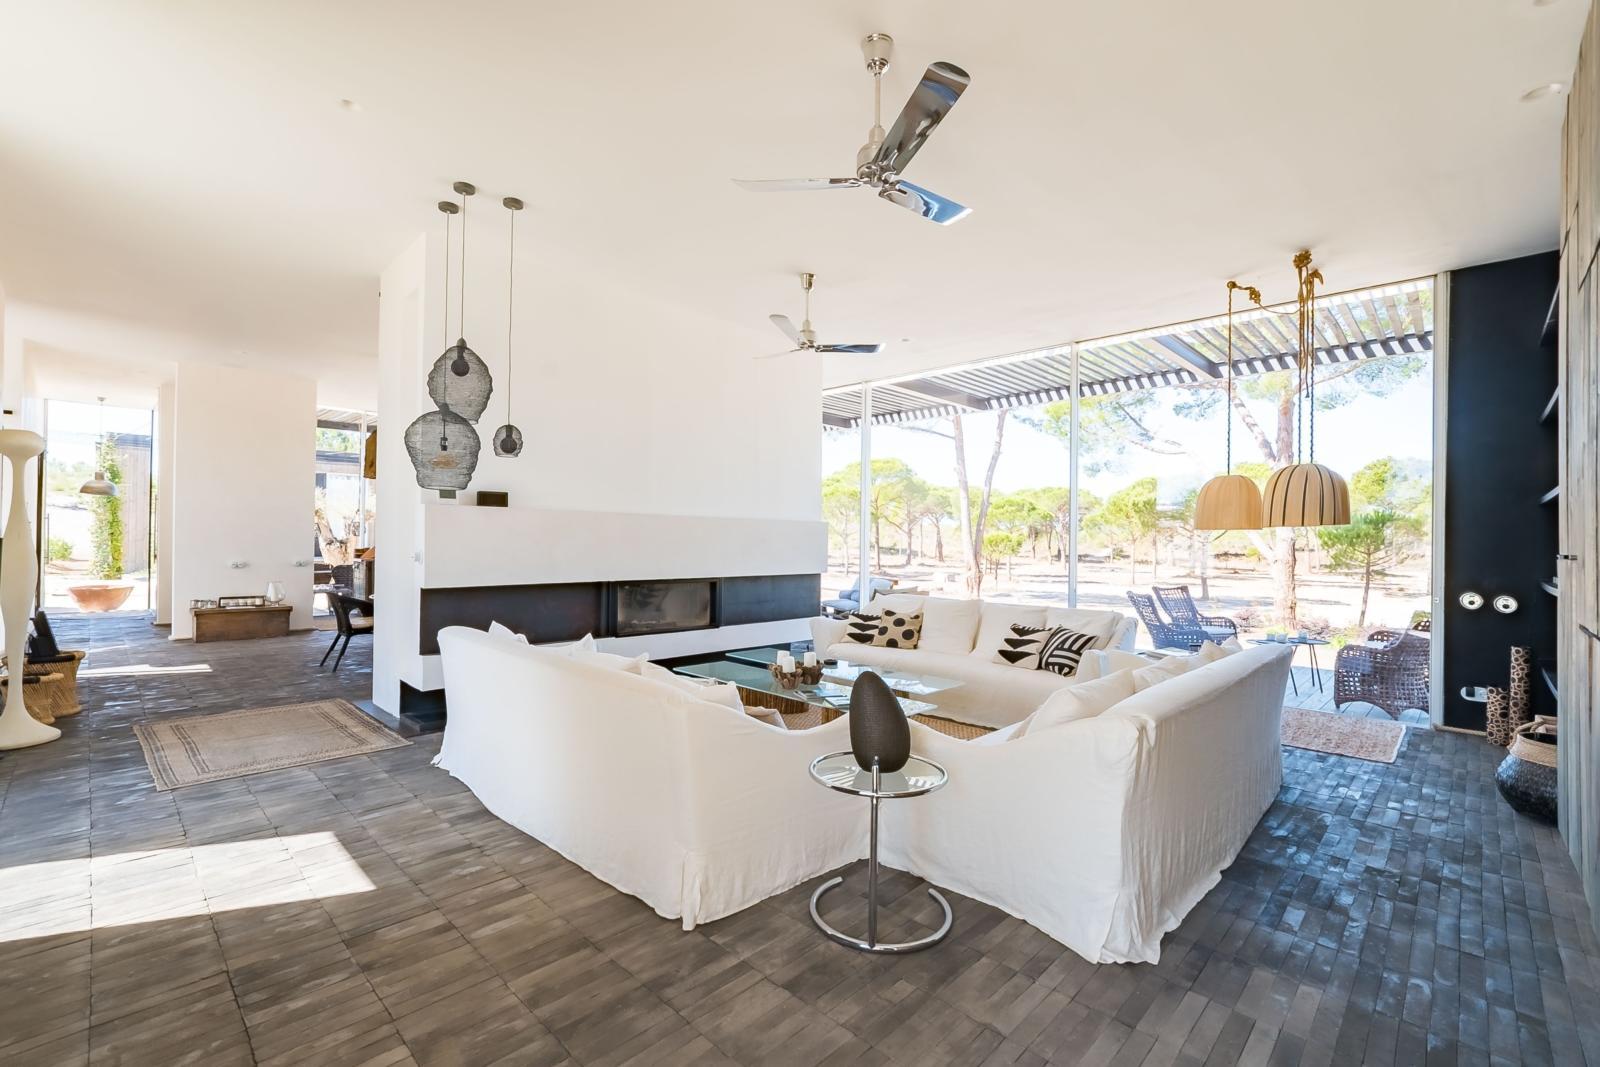 villas-luxe-a-vendre-costa-azul-dernieres-technologies-confort-propriete-haut-de-gamme